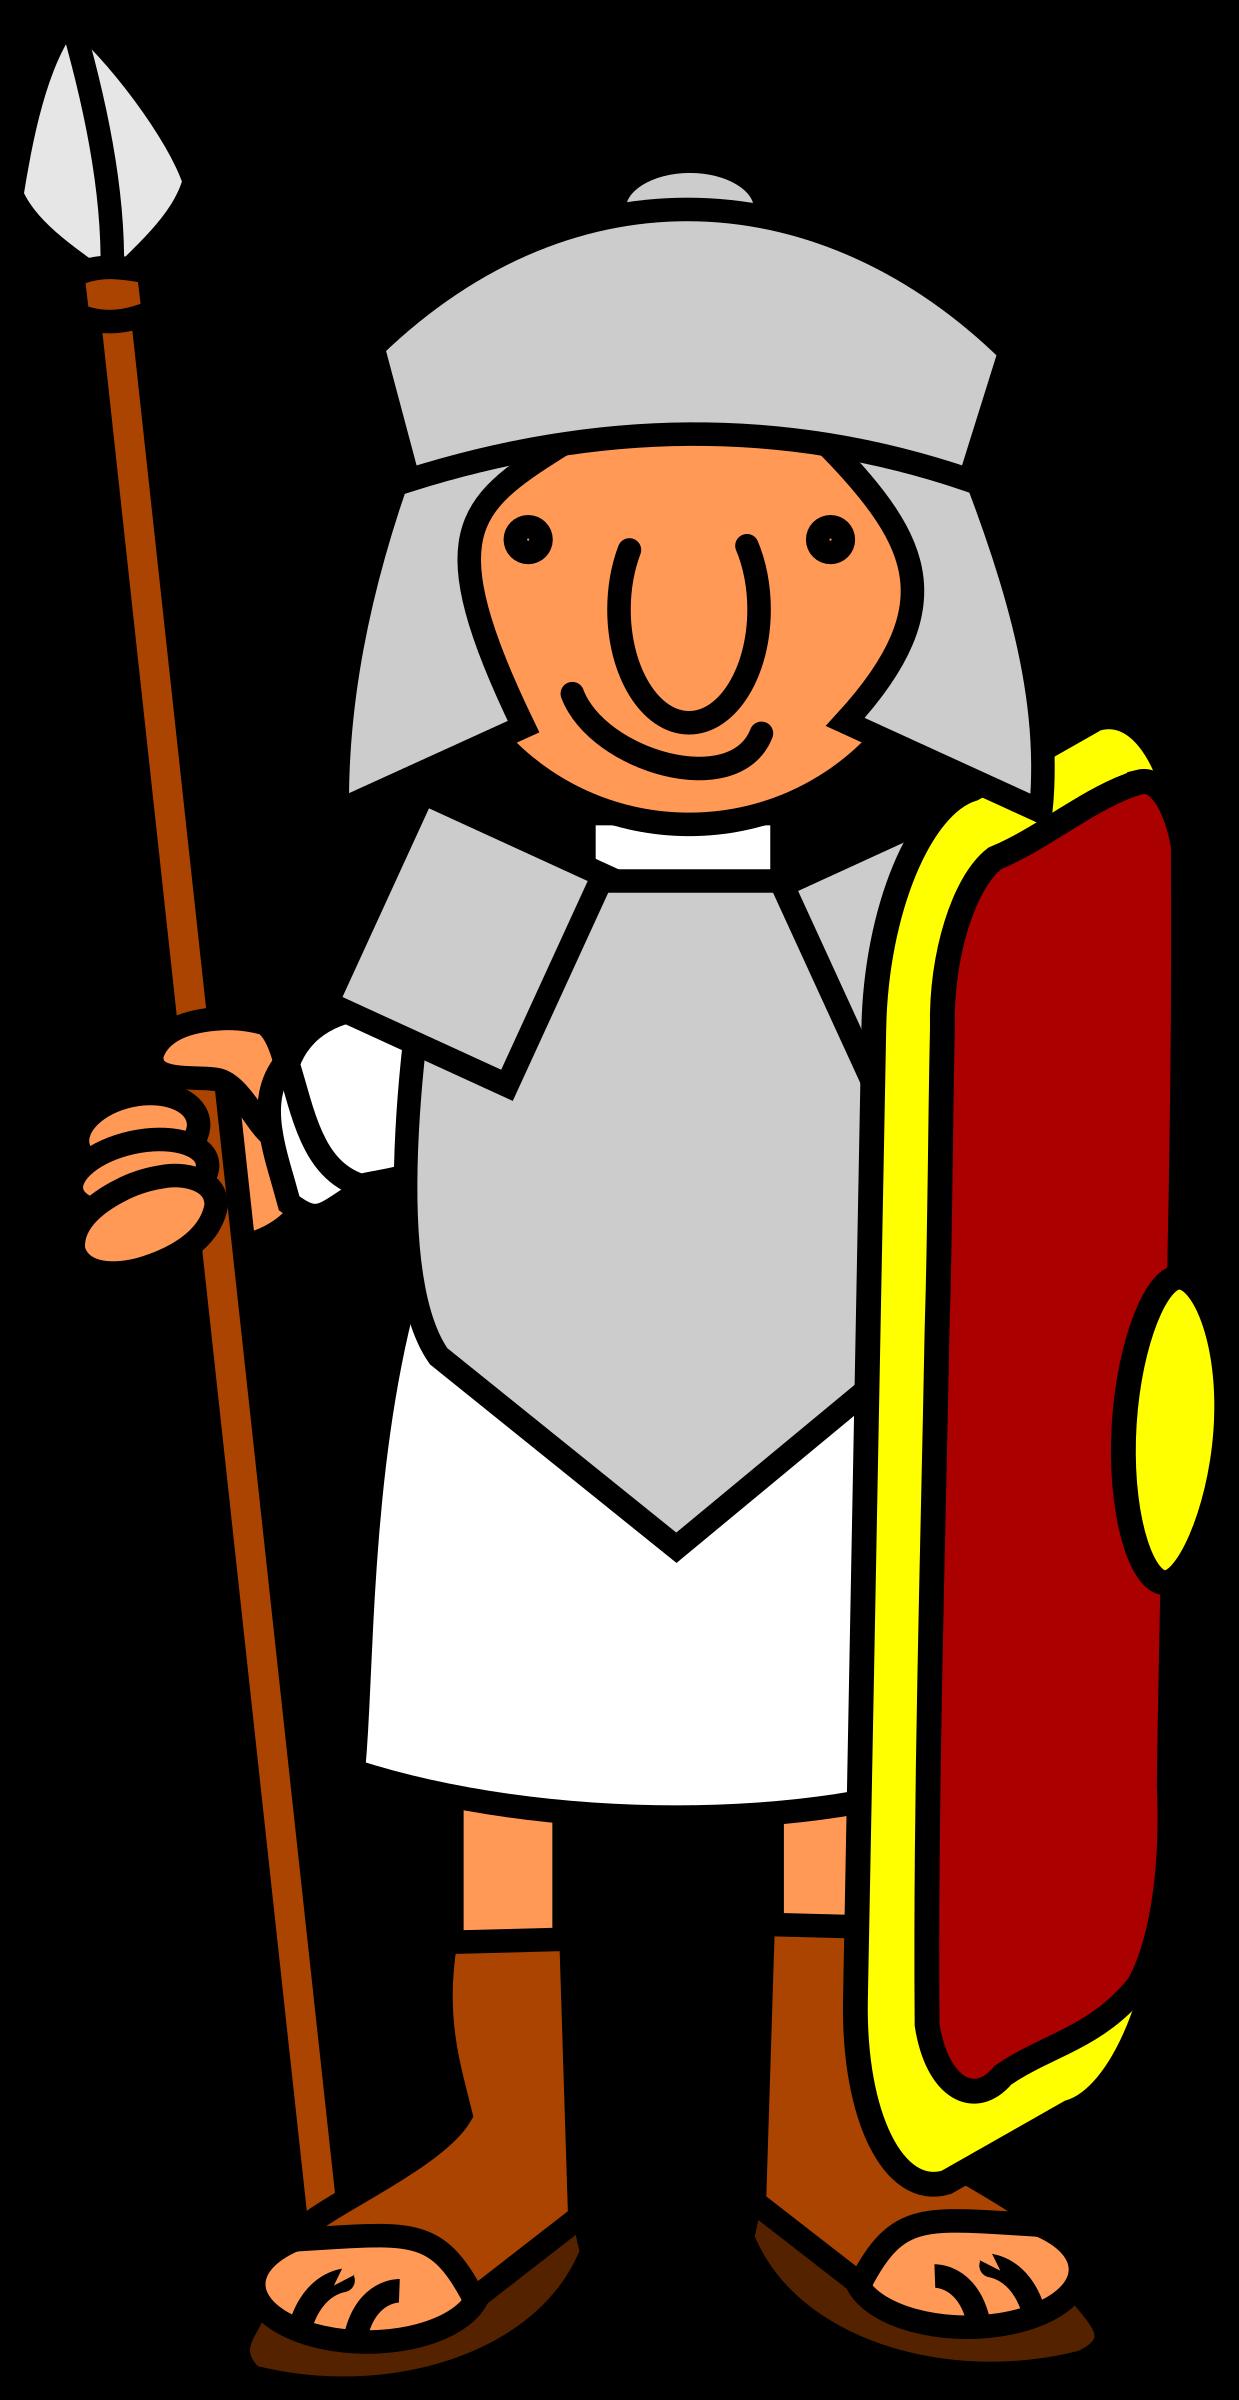 Roman soldier big image. Soldiers clipart foji